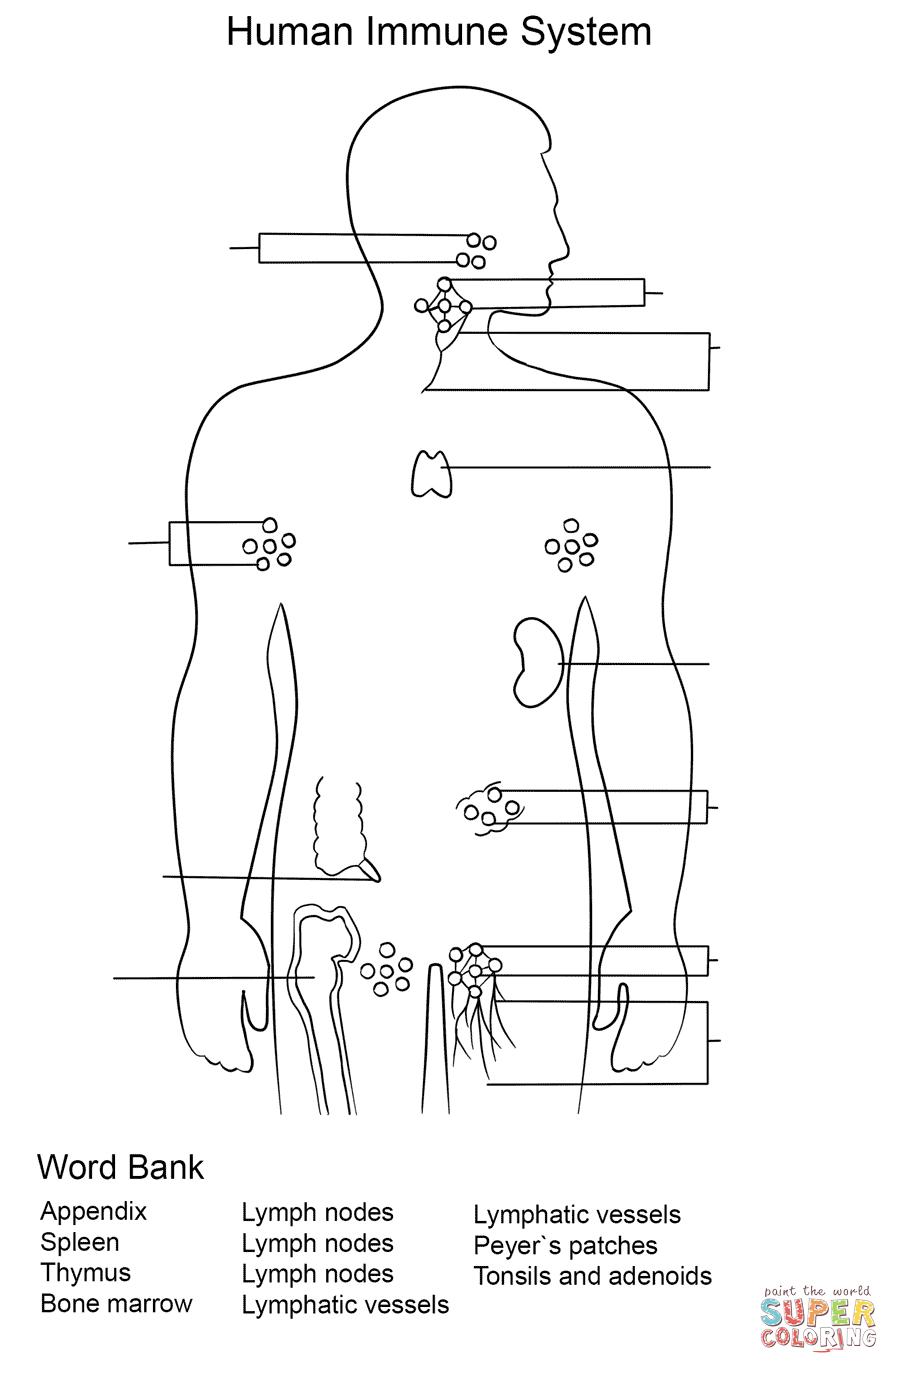 Immune System Worksheet coloring page Free Printable